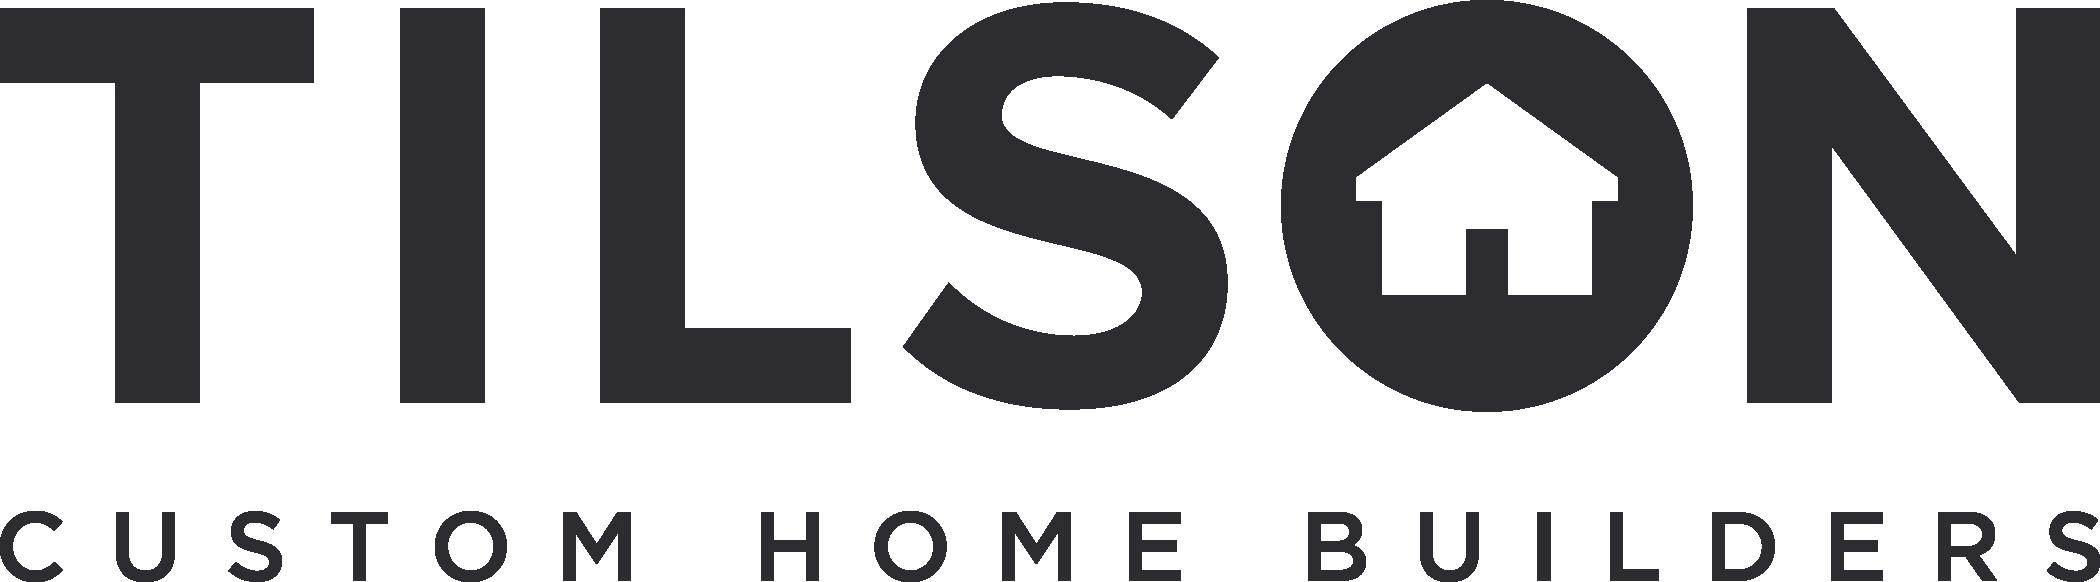 TIL-logo-tagline-dark